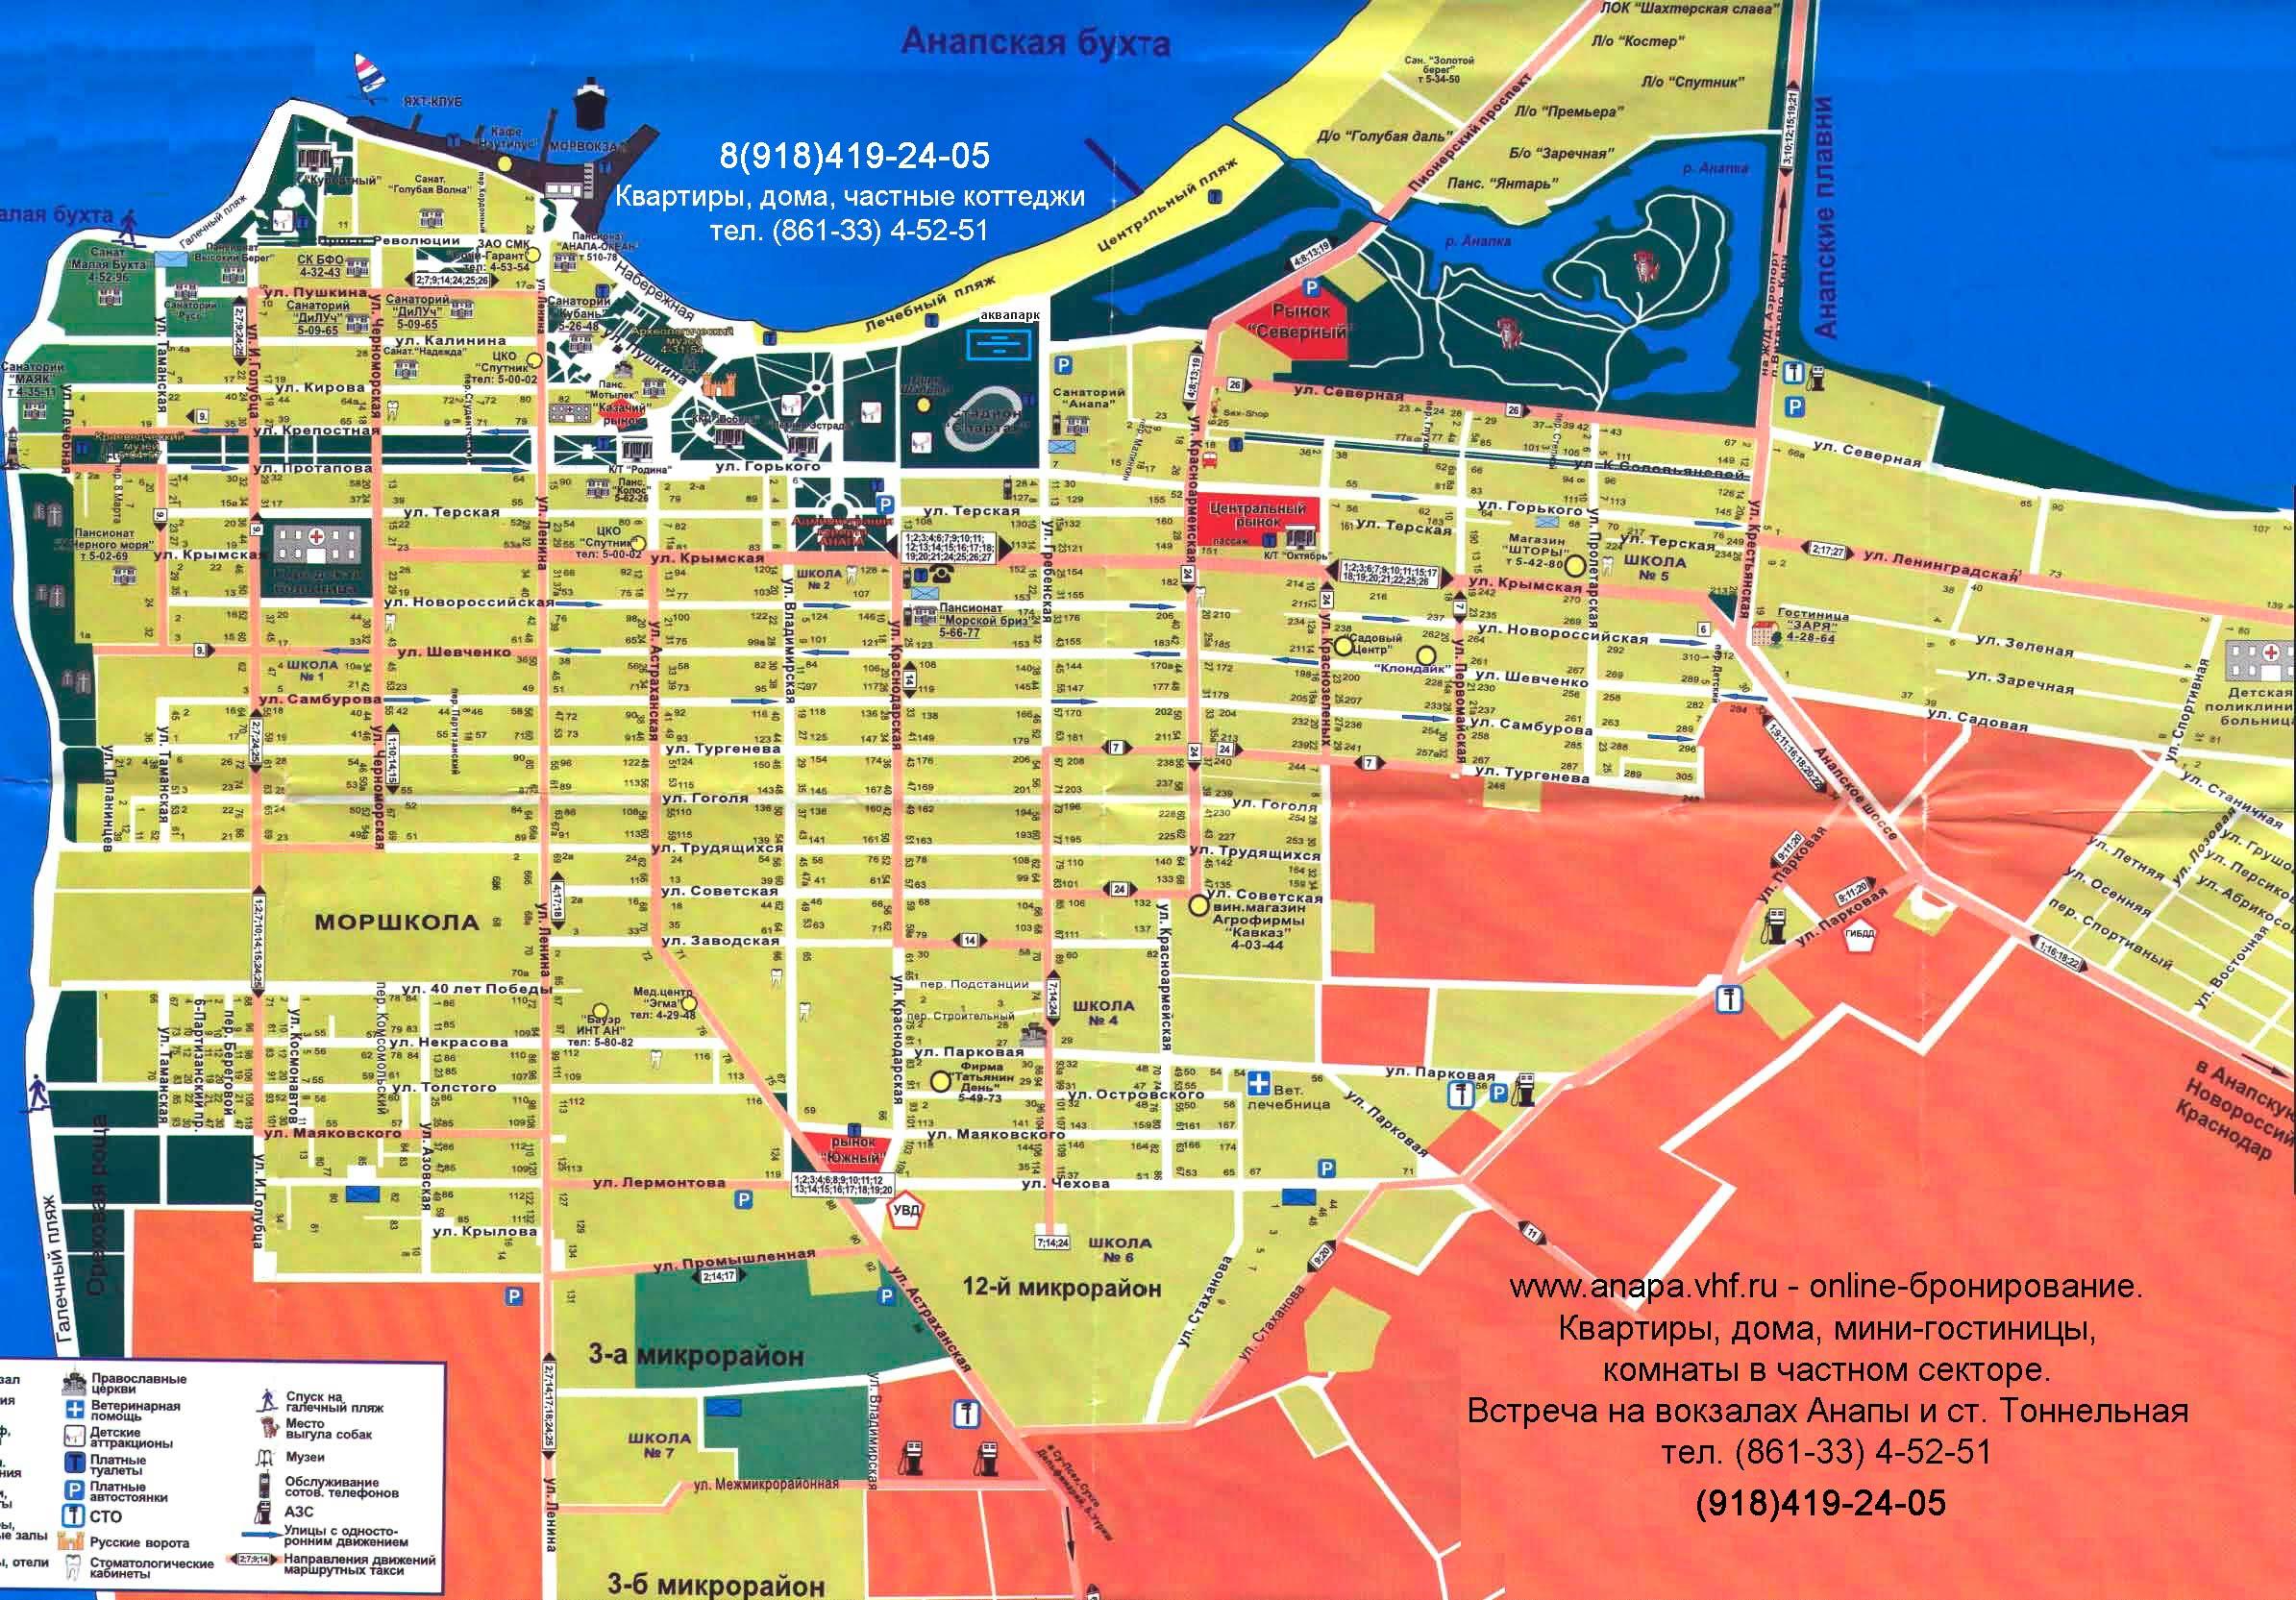 b Анапа отдых /b 2013 карта города - Хобби и.